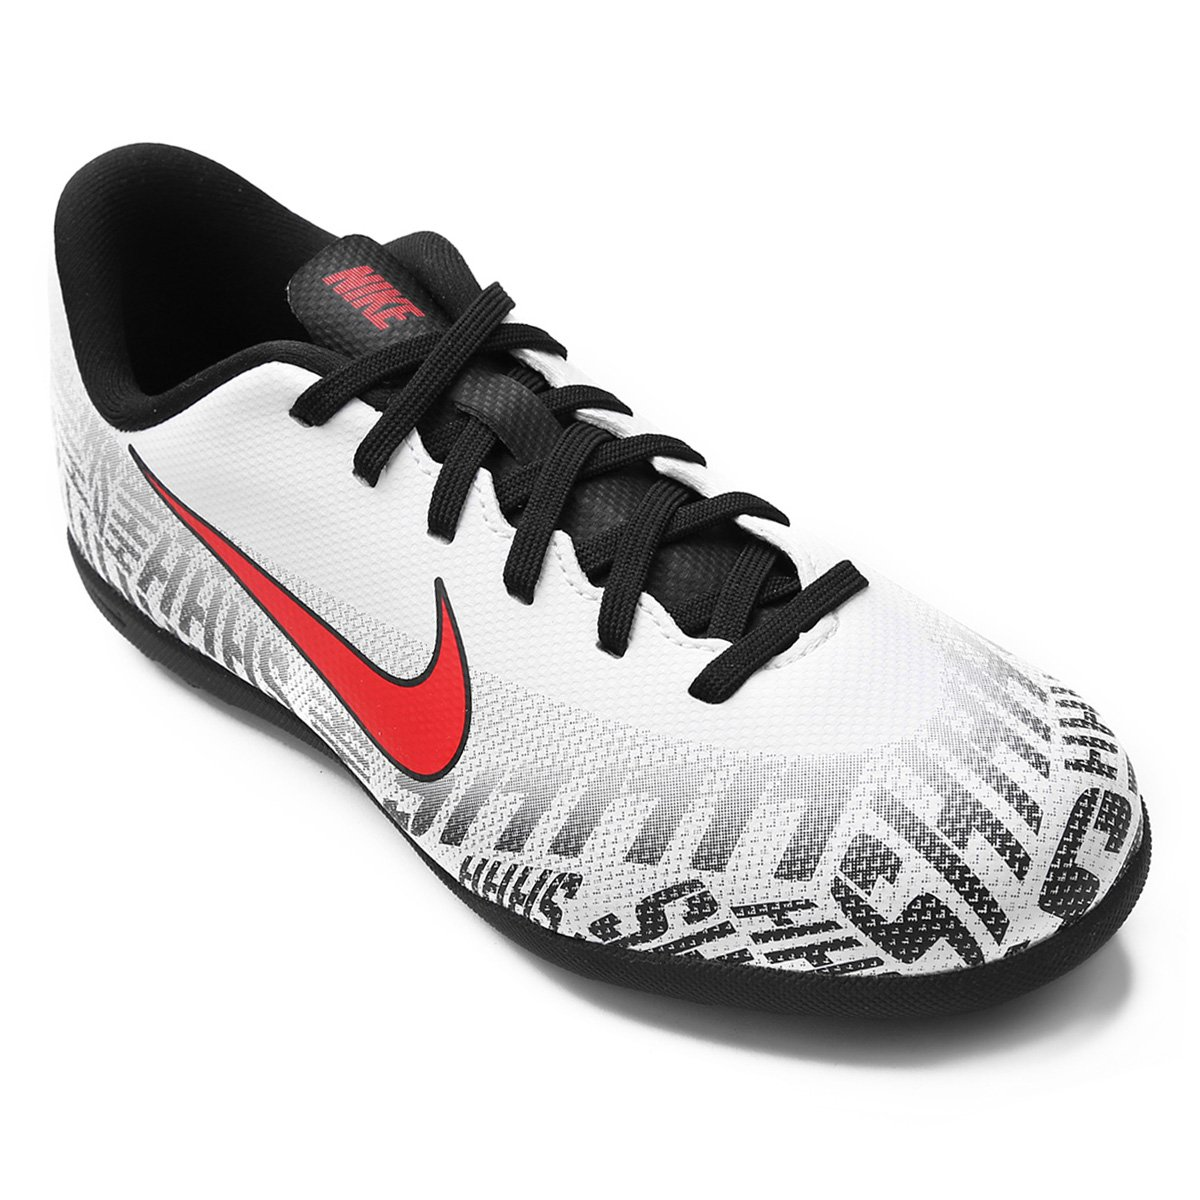 53d64db826 Chuteira Society Infantil Nike Mercurial Vapor 12 Club Gs Neymar Jr TF -  Branco e Vermelho